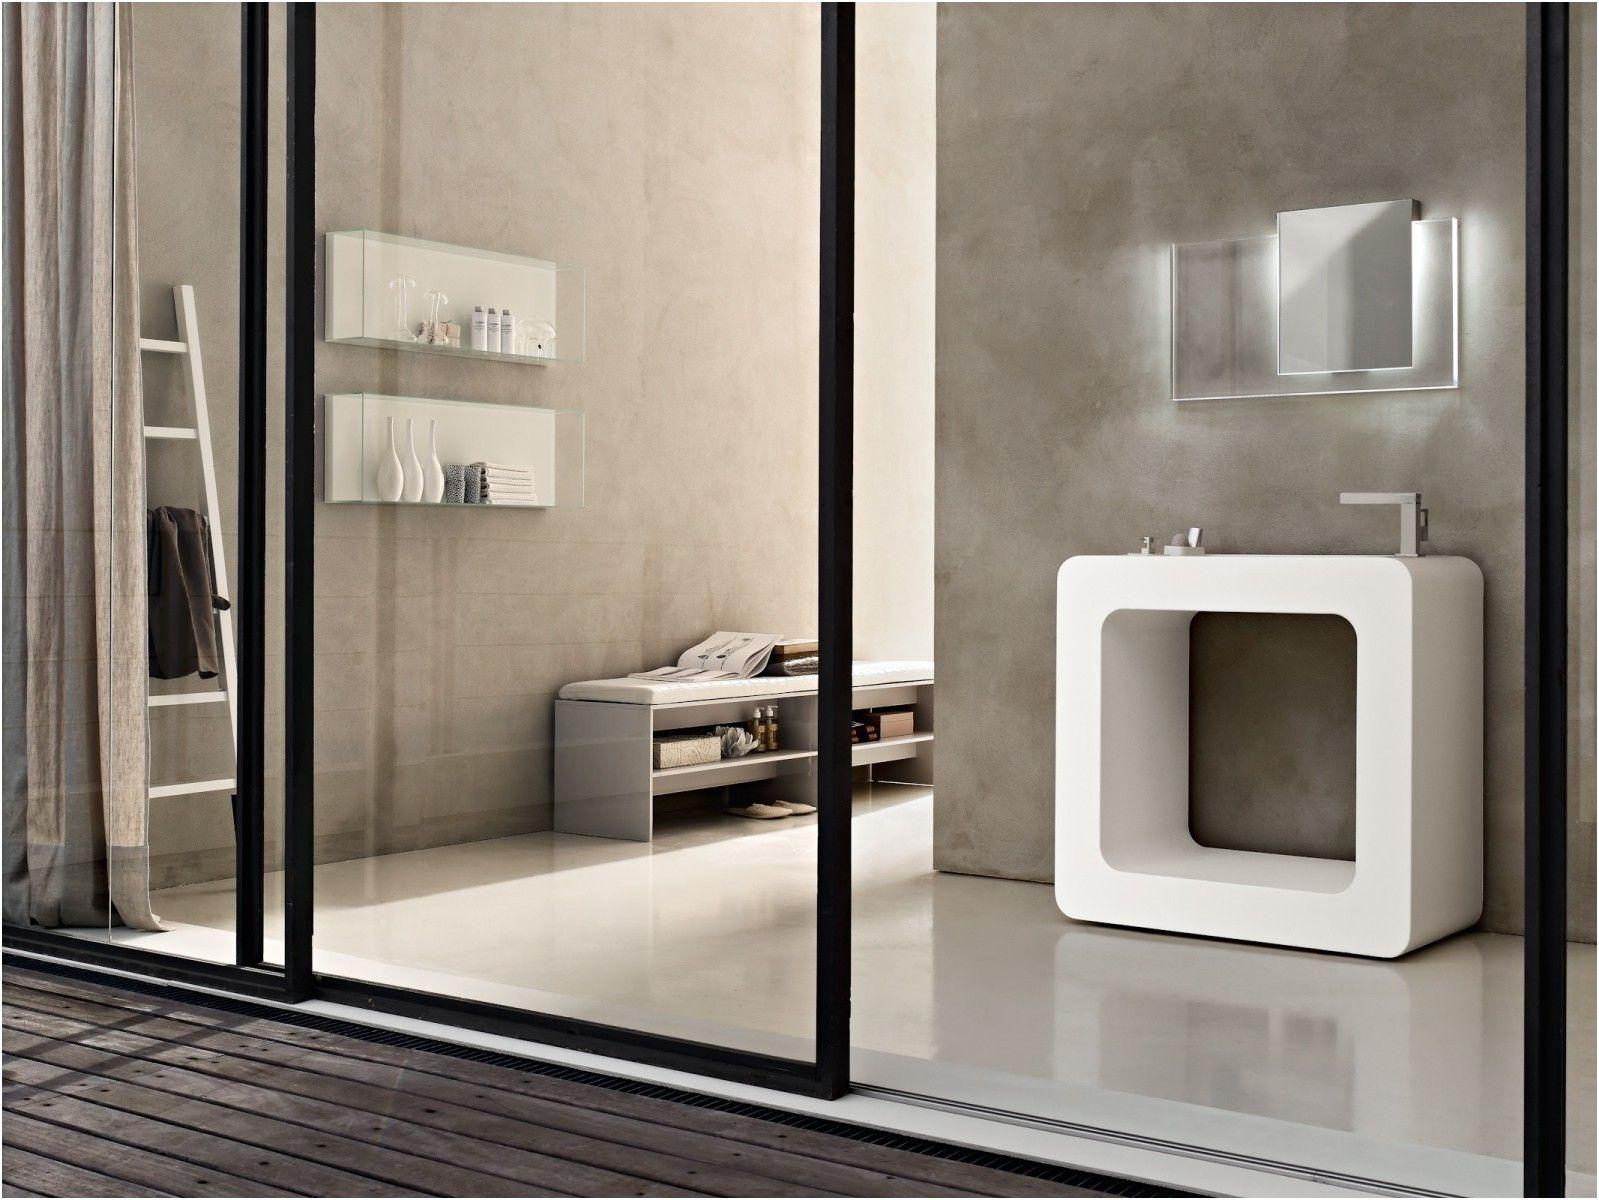 Ultra Modern Italian Bathroom Design From Italian Bathrooms Designs